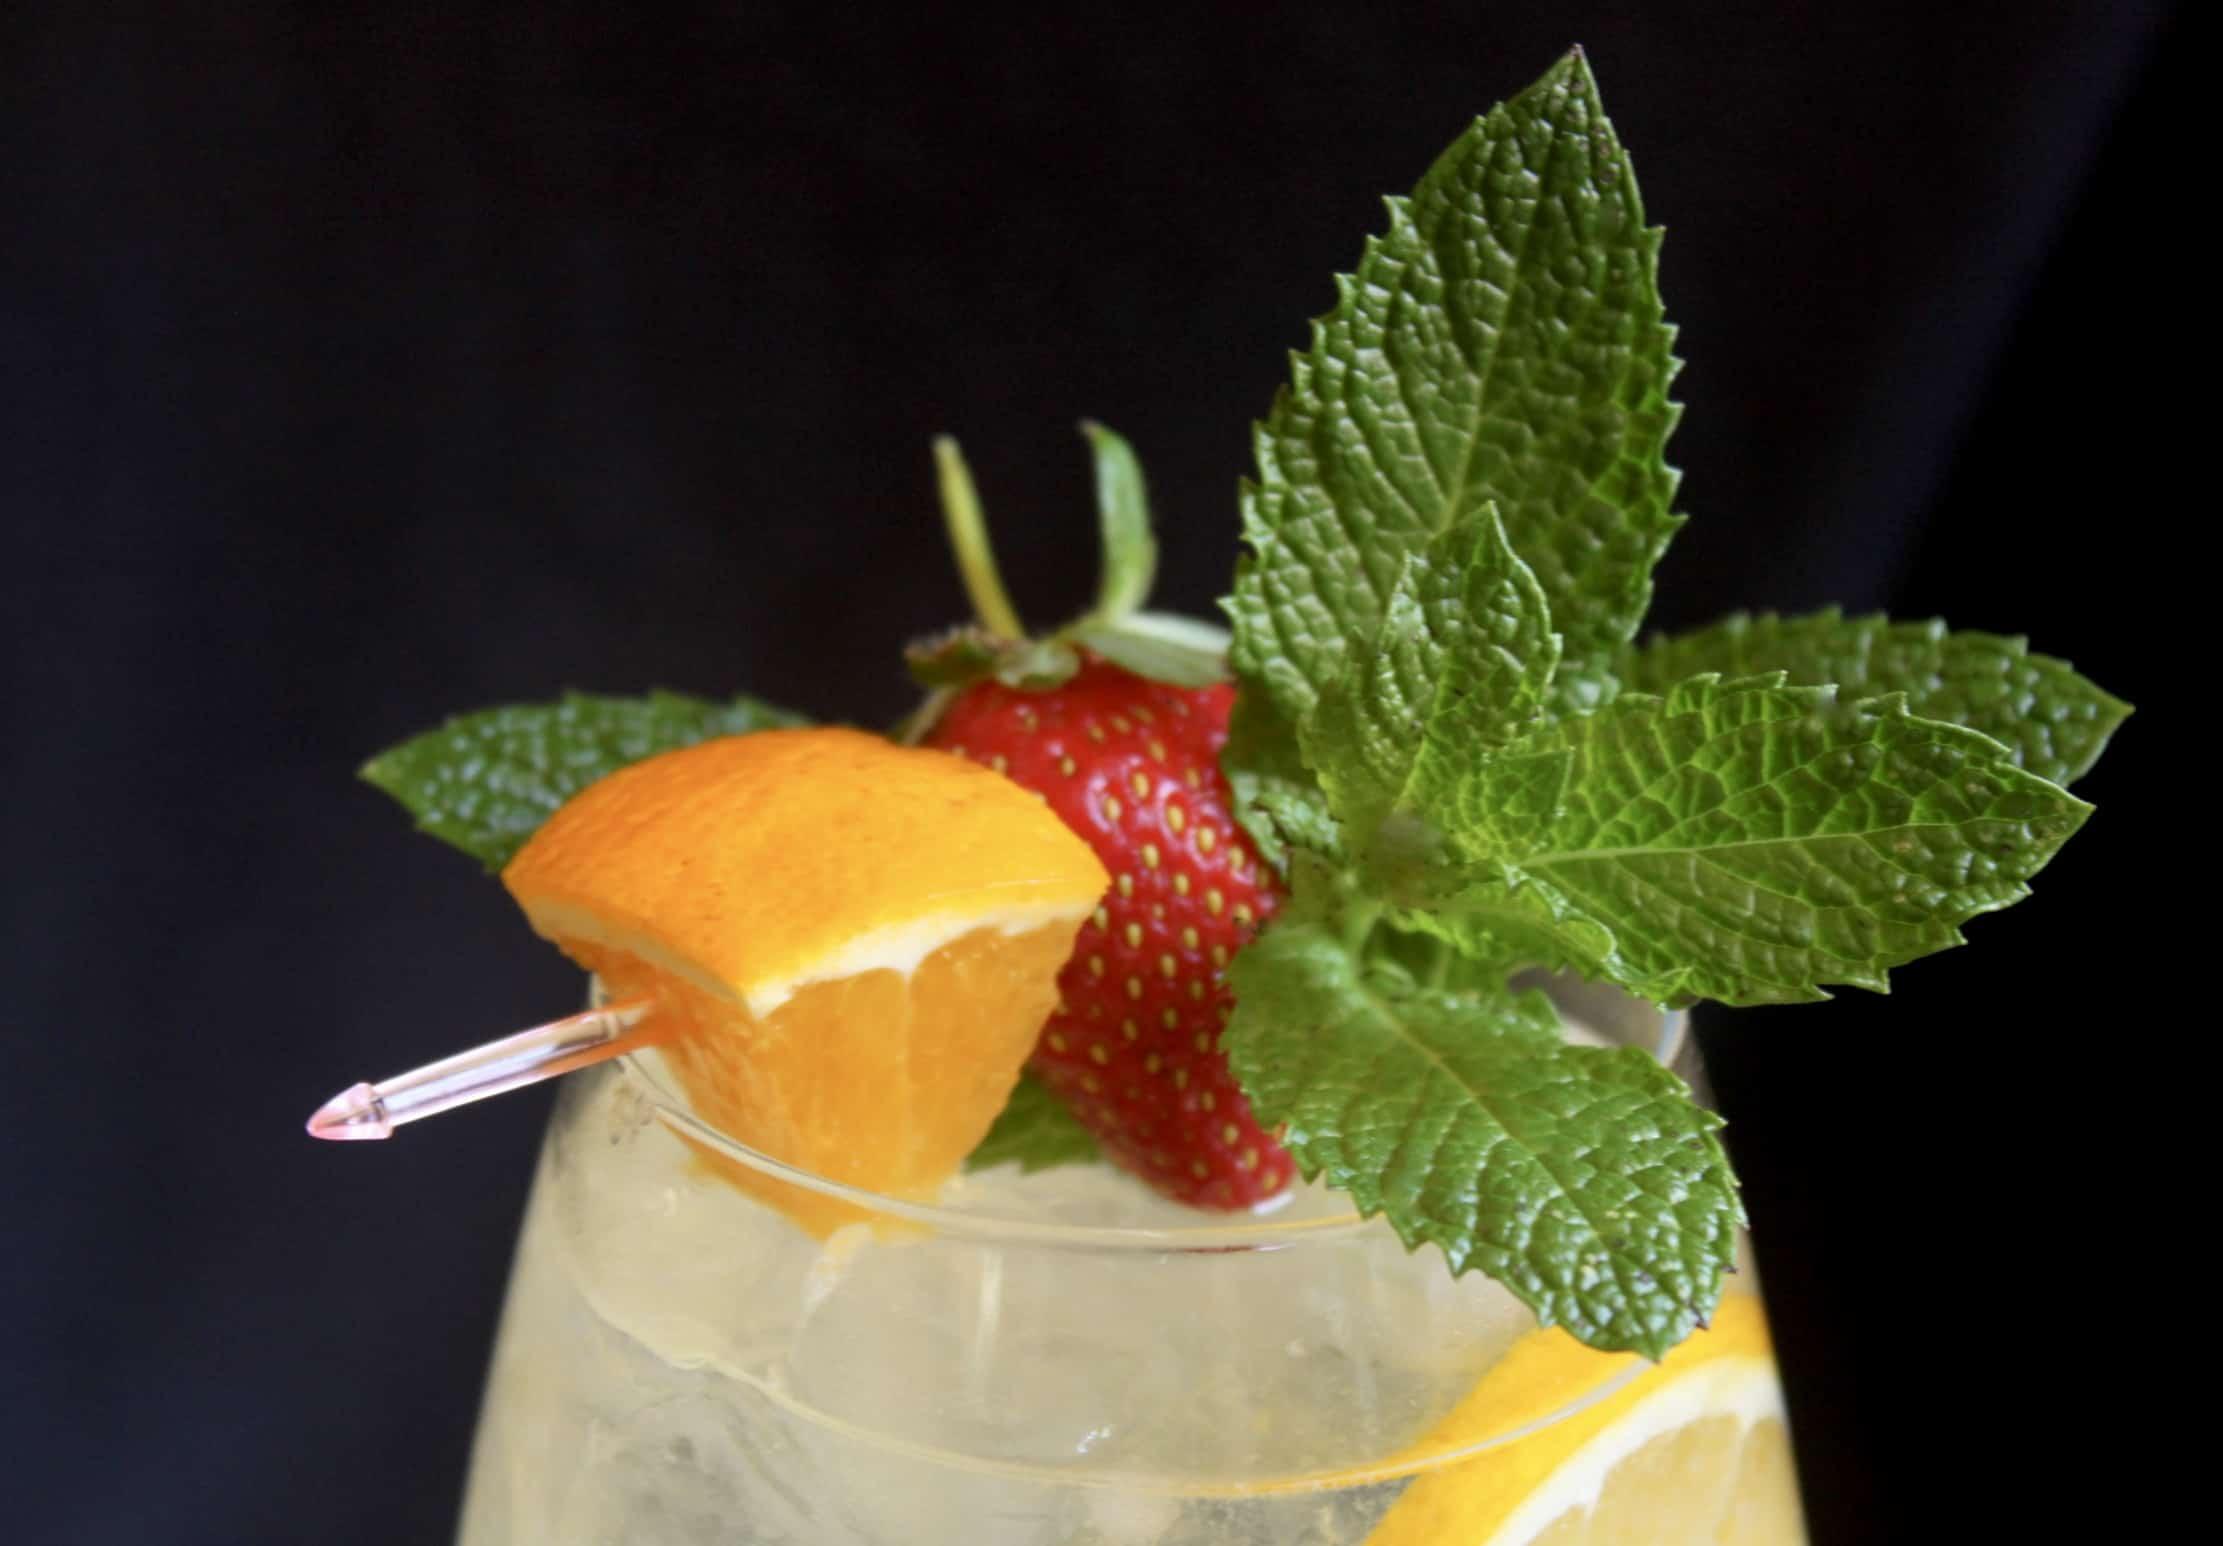 garnish on a limoncello spritz